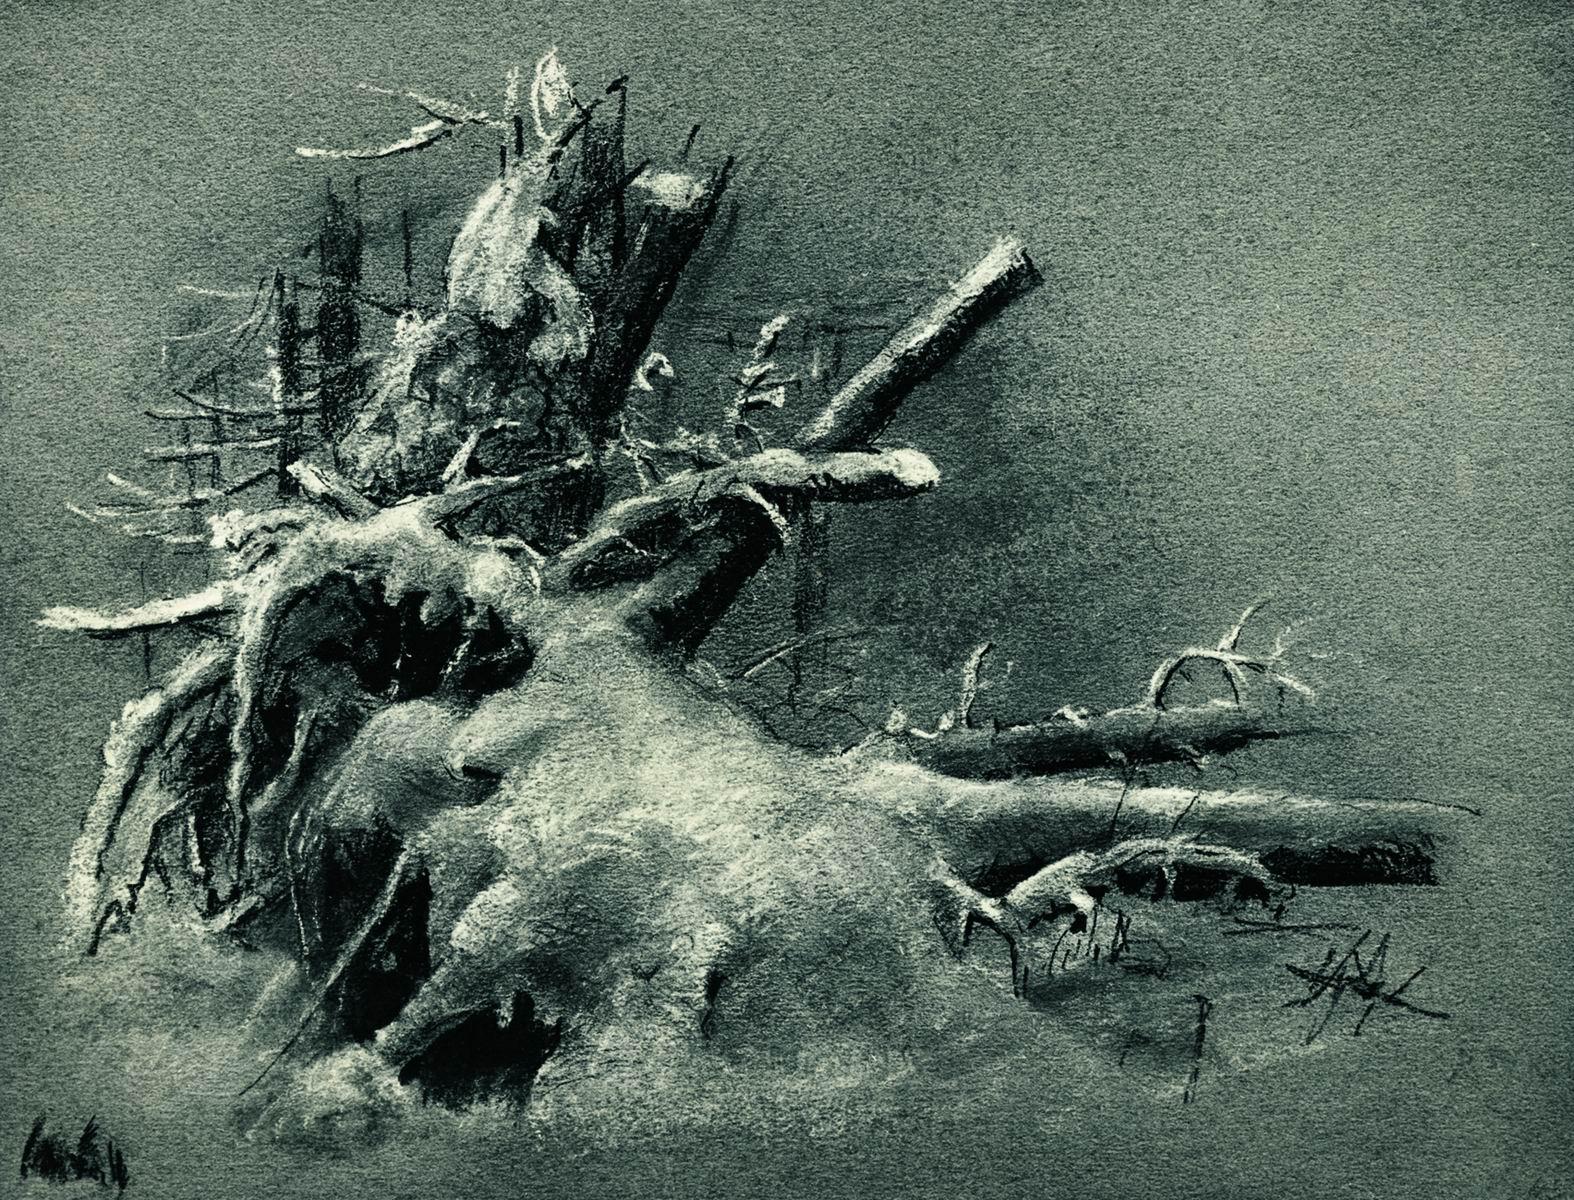 Шишкин. Выкорчеванные пни под снегом. 1890-е